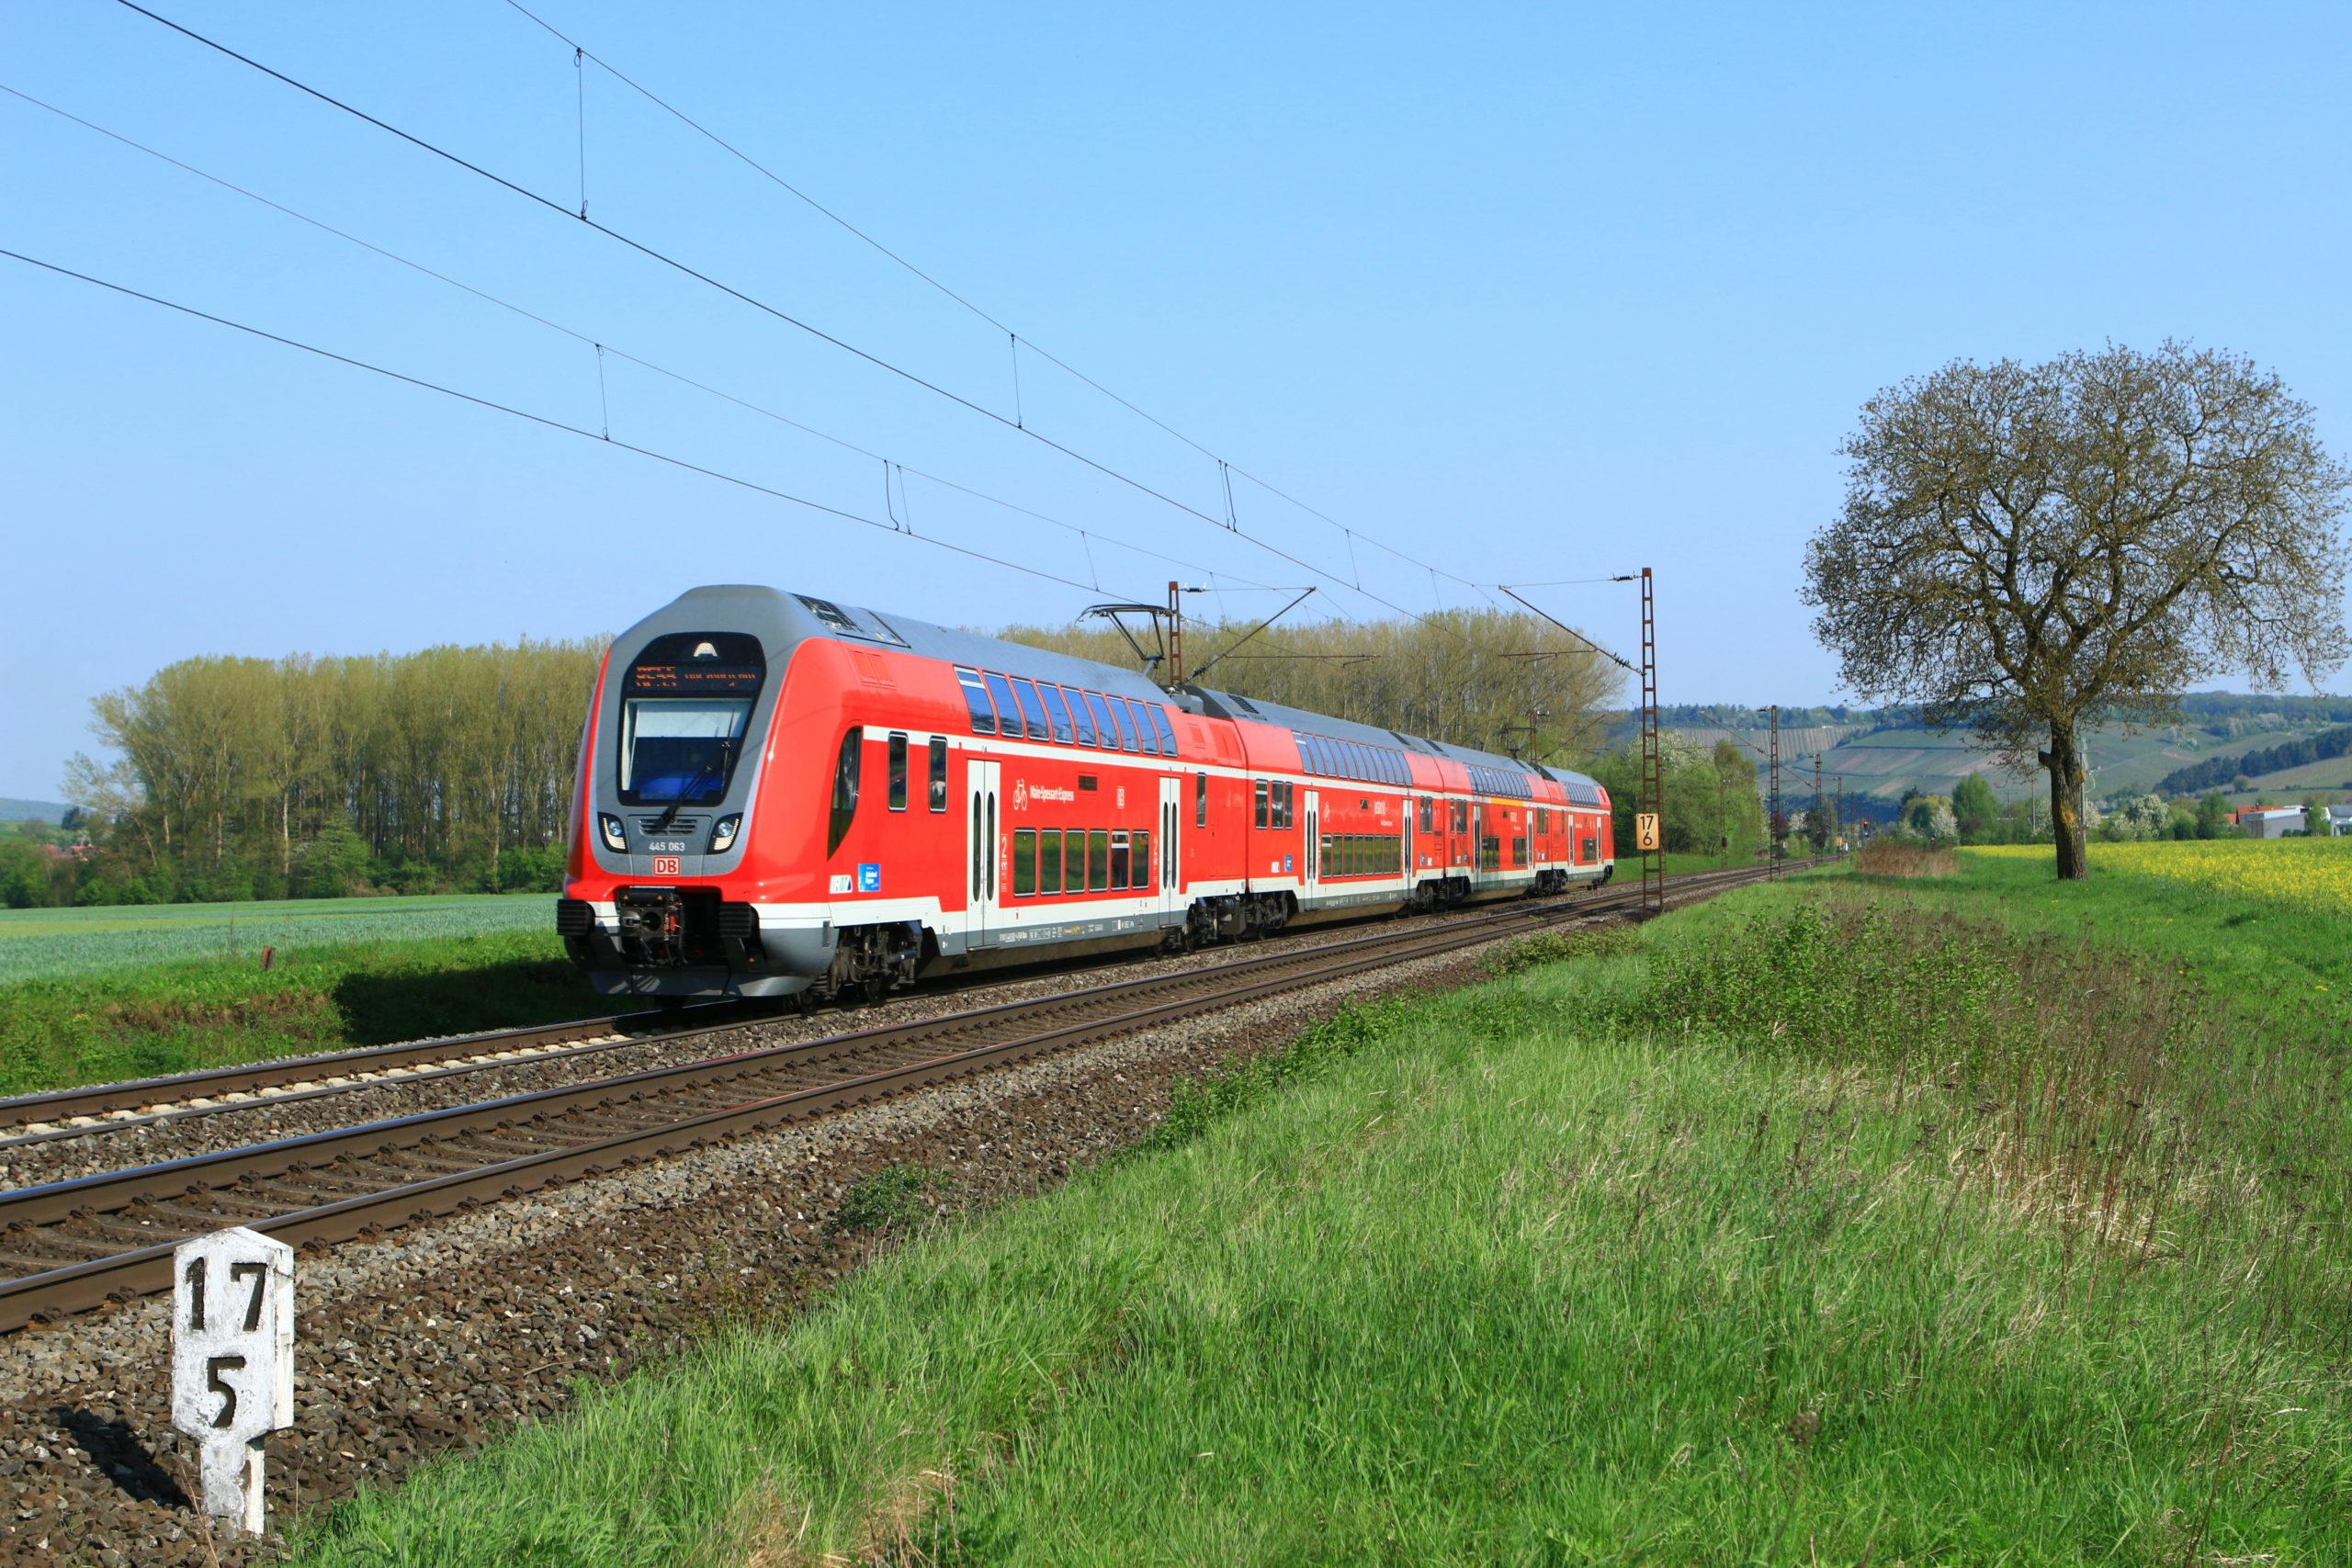 DB Regio Twindexx double-decker train